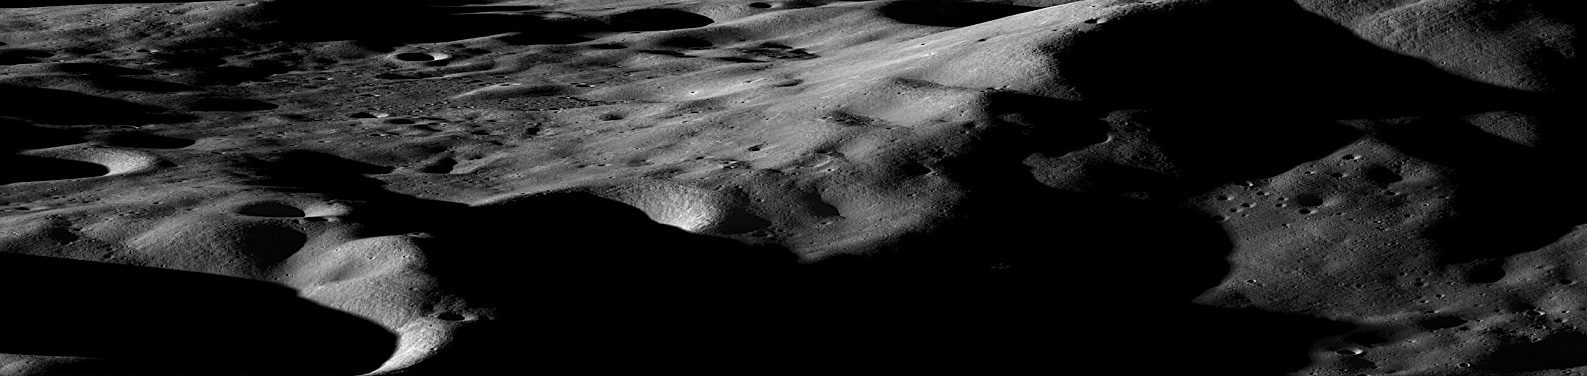 Lunar Mountains